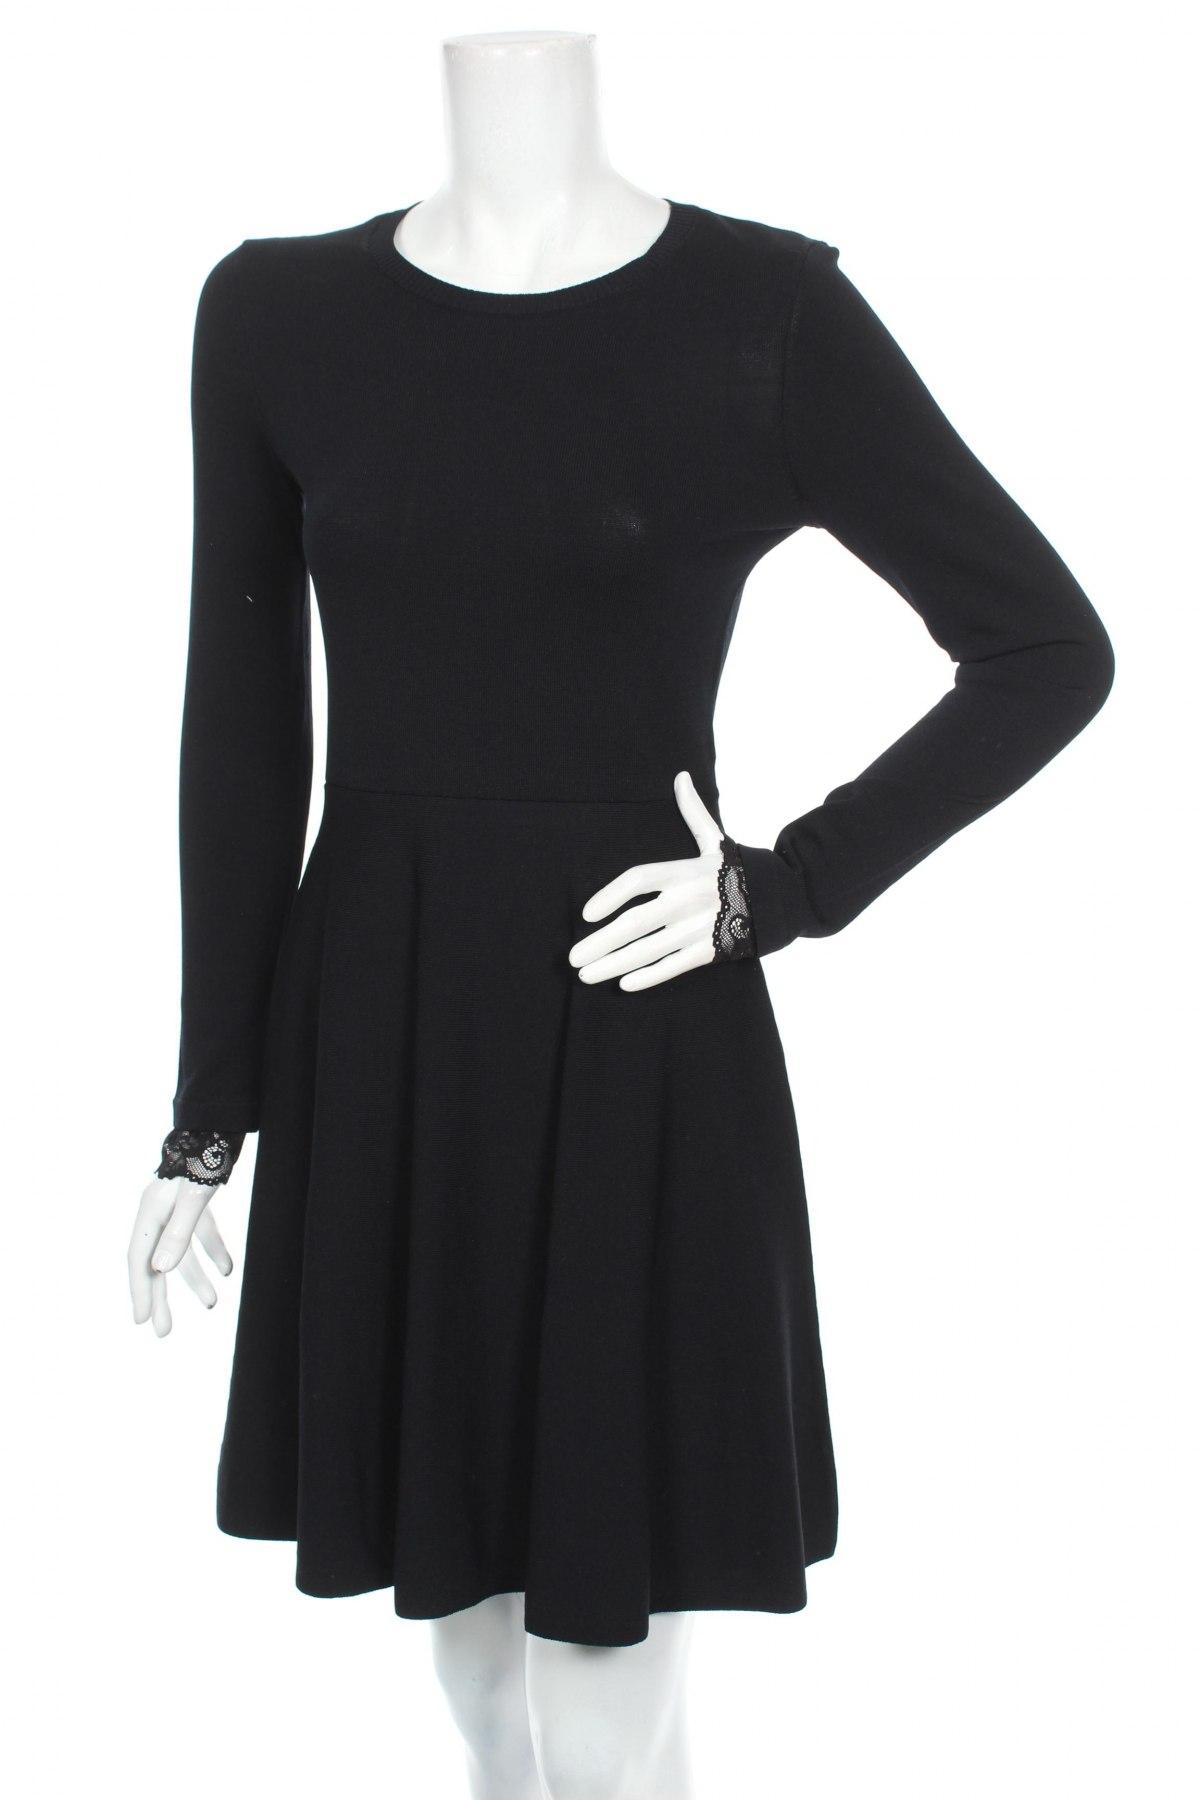 91203d1a1a8f Φόρεμα Y.a.s - σε συμφέρουσα τιμή στο Remix -  103541564